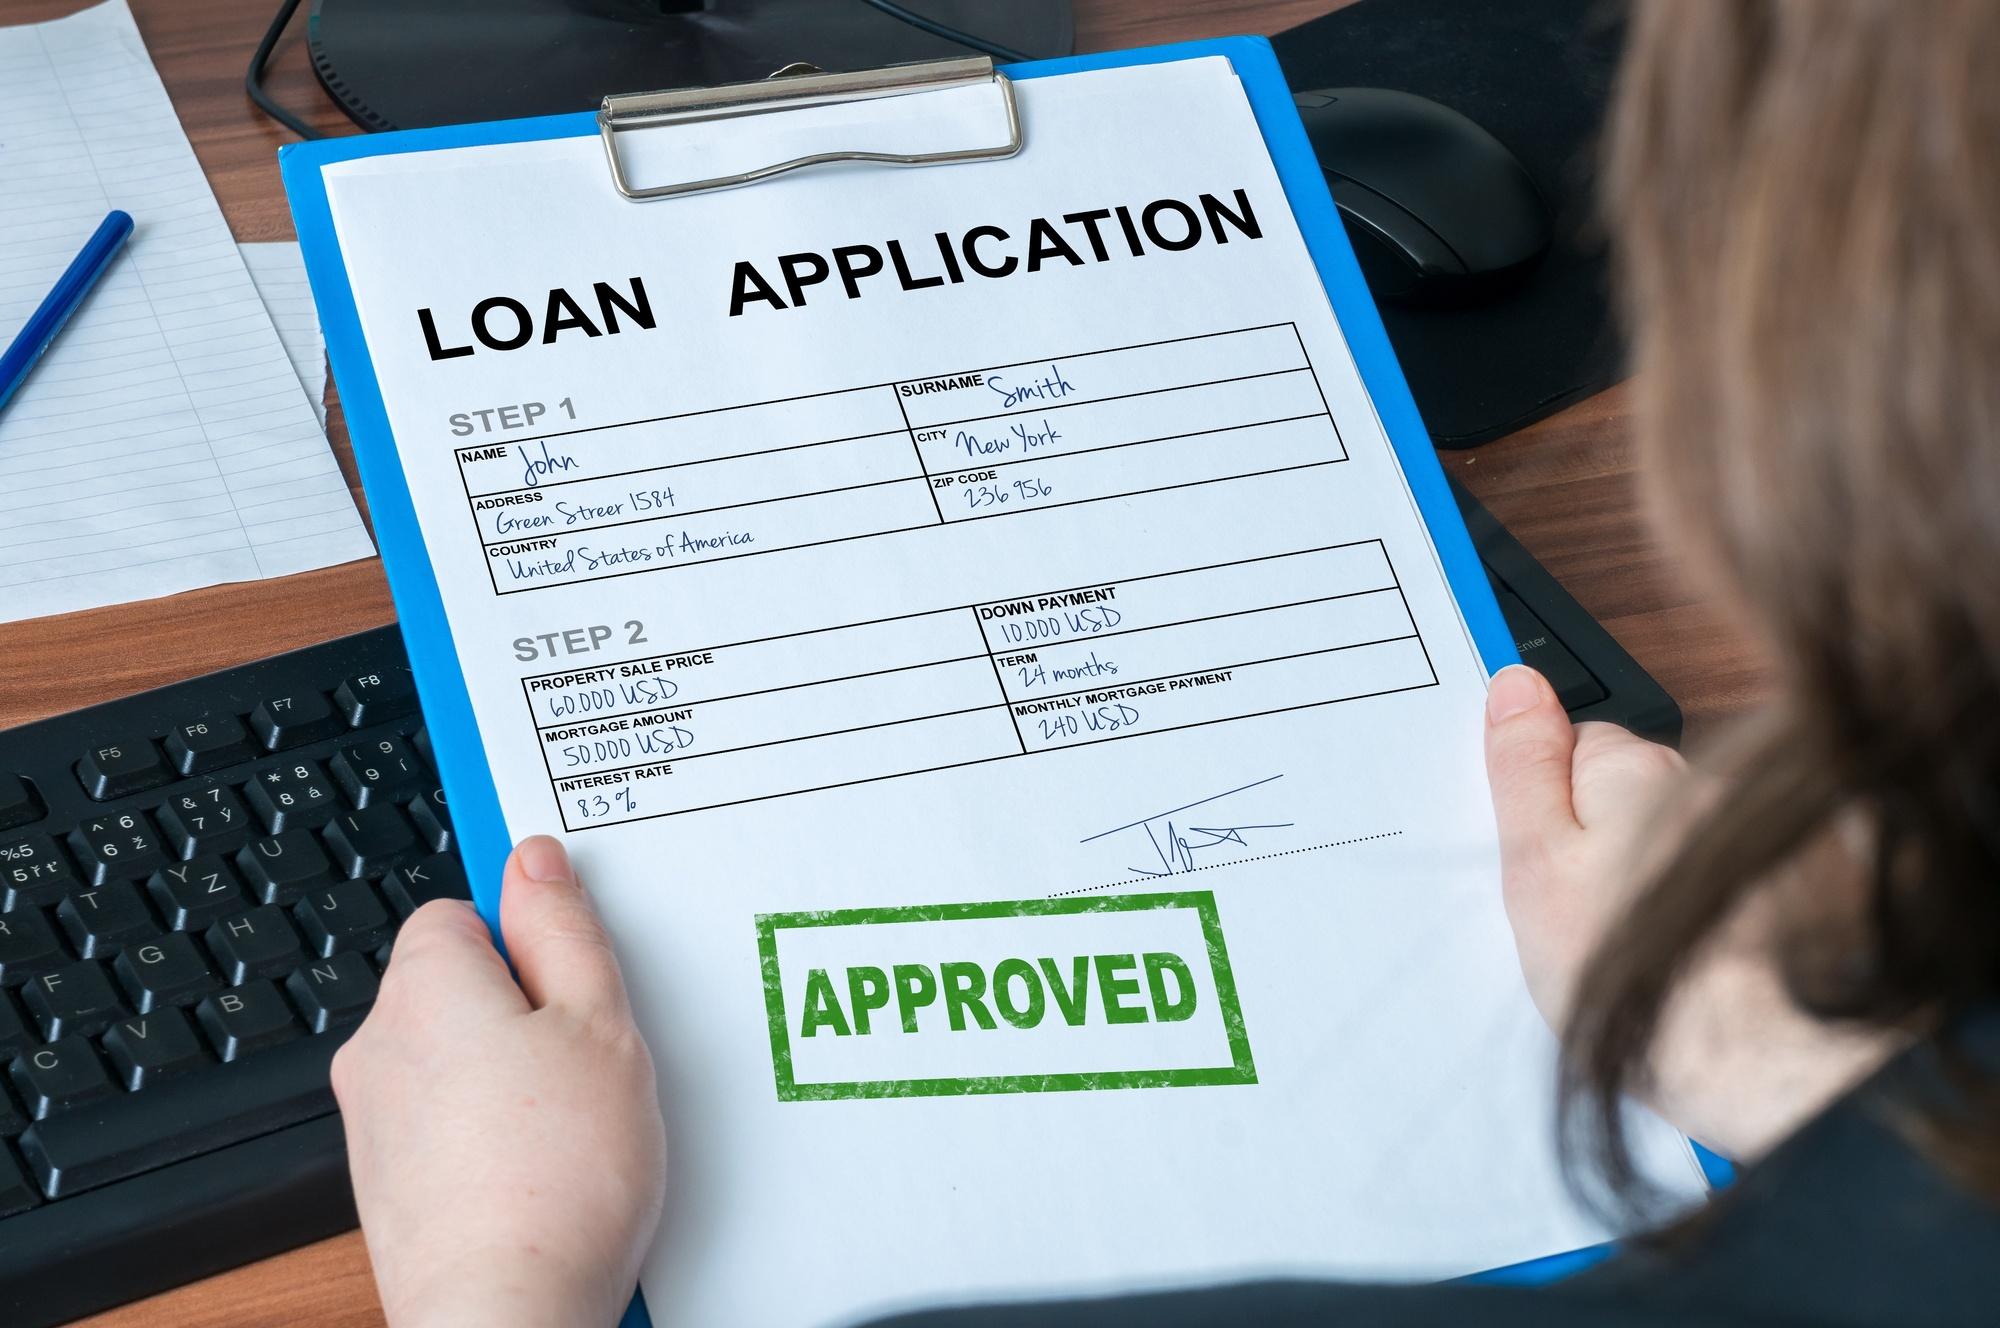 Car Loan Applications